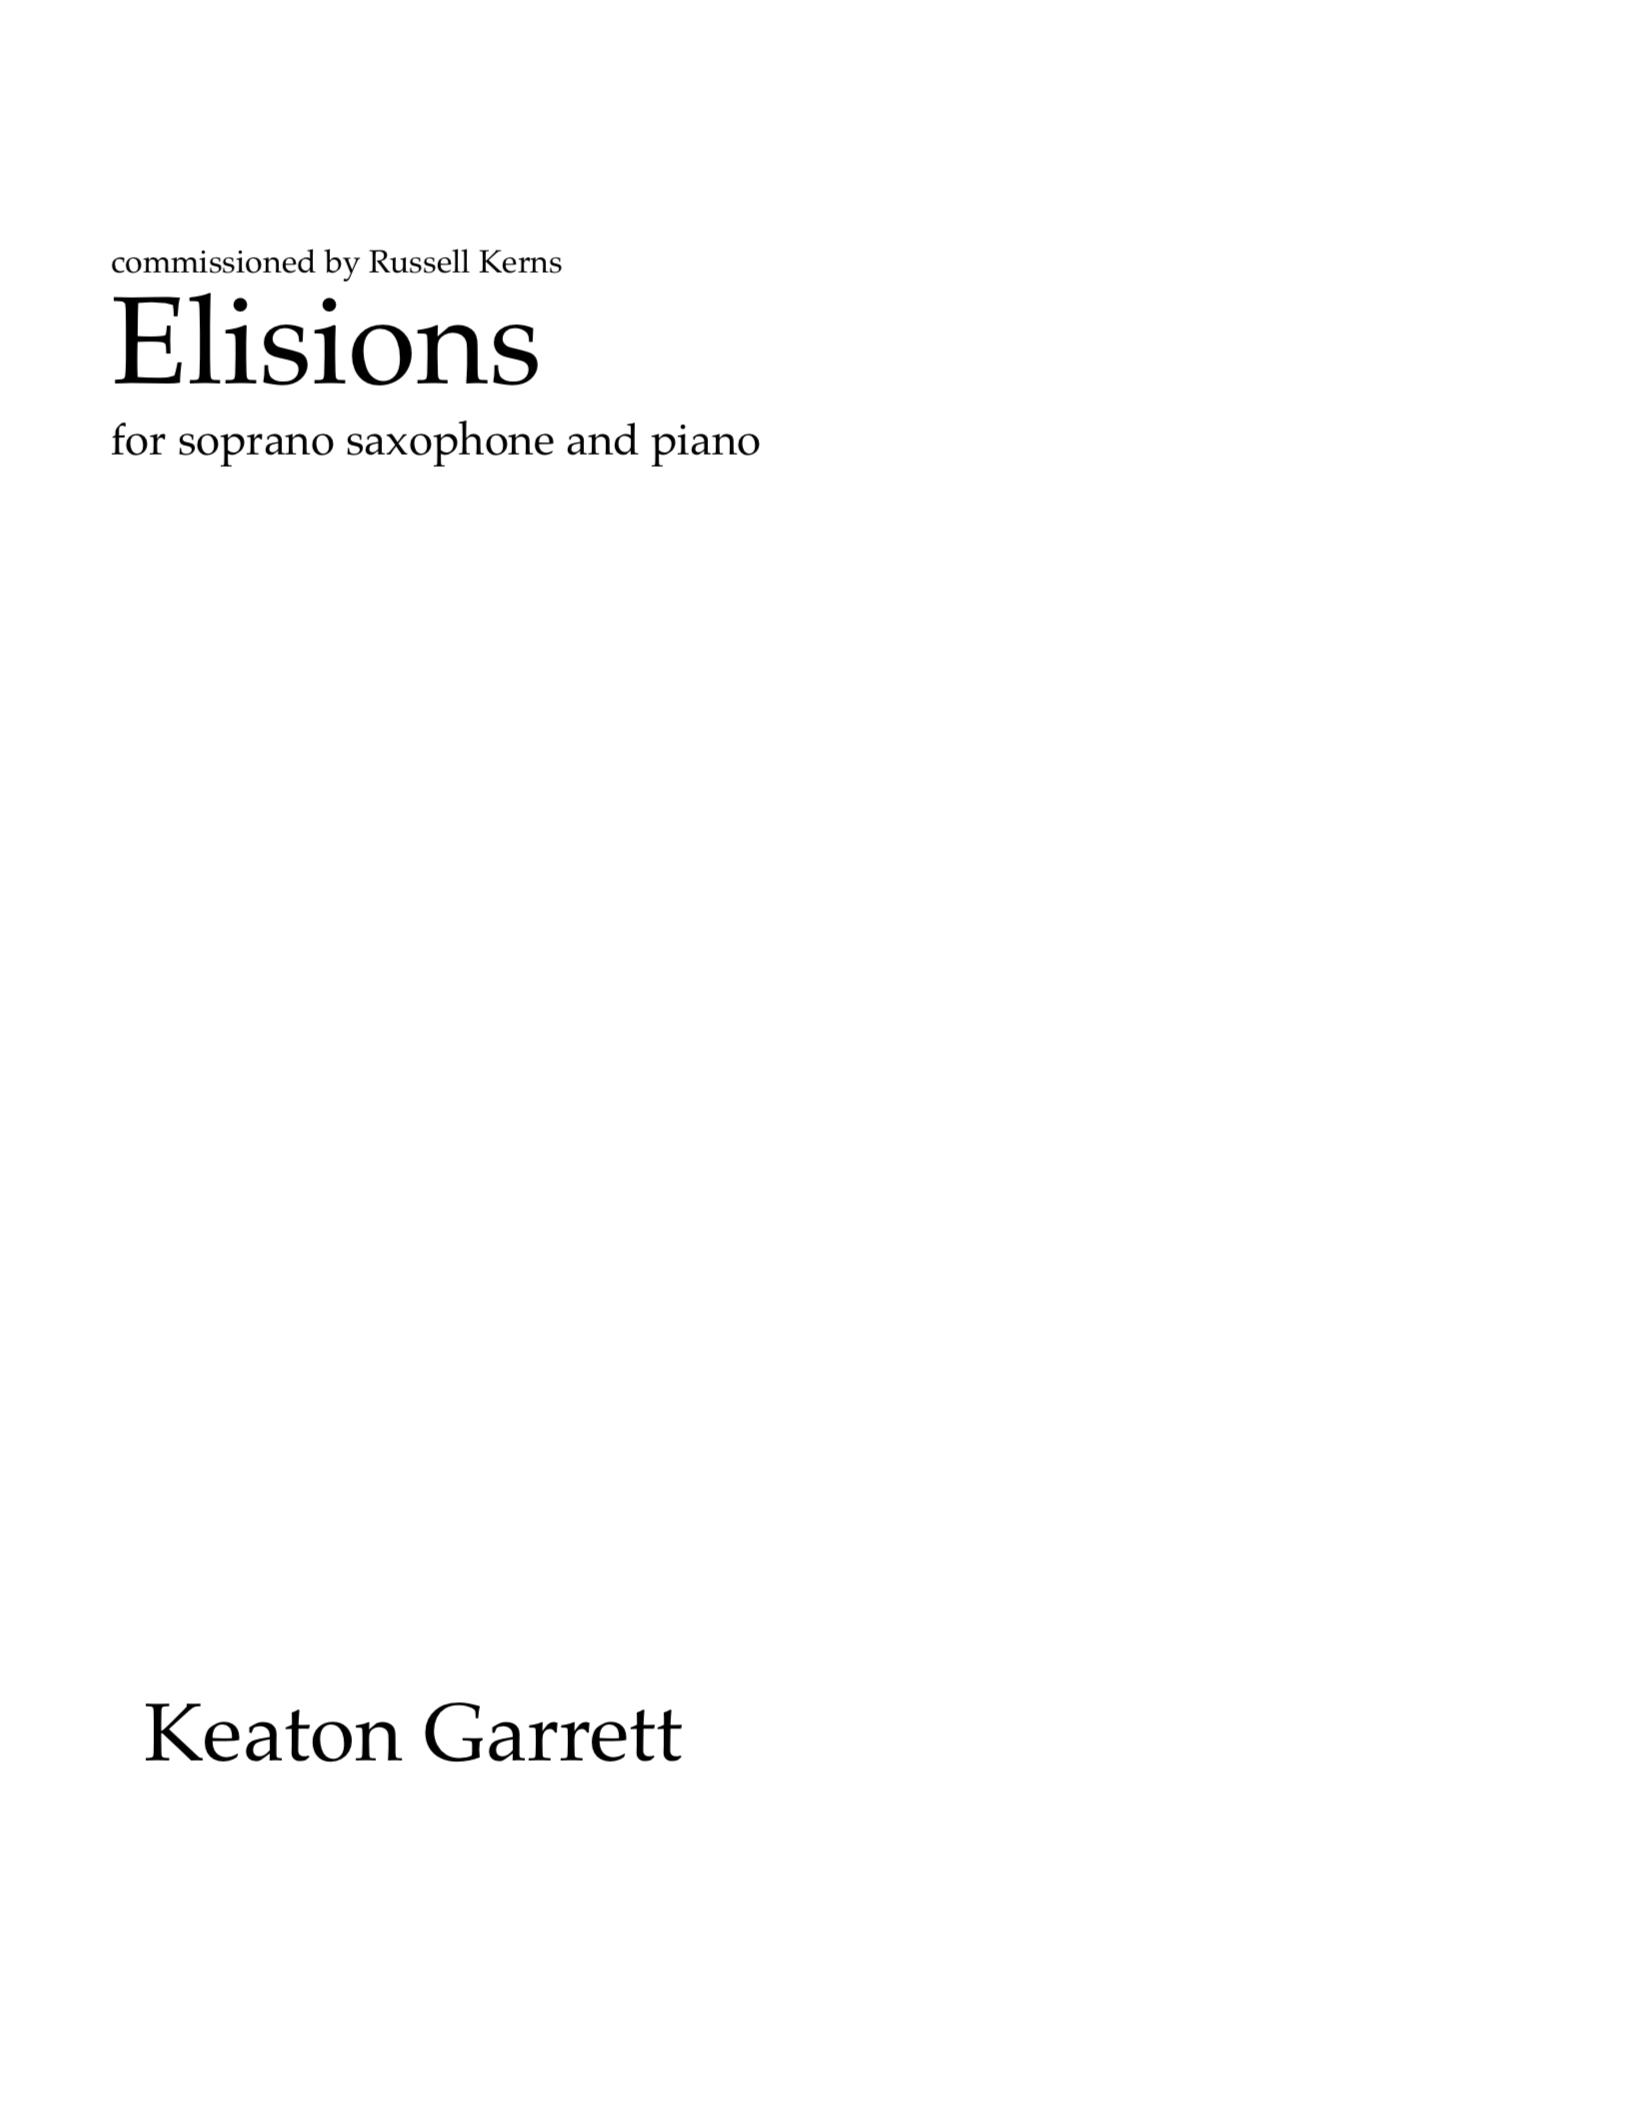 Elisions by Keaton Garrett